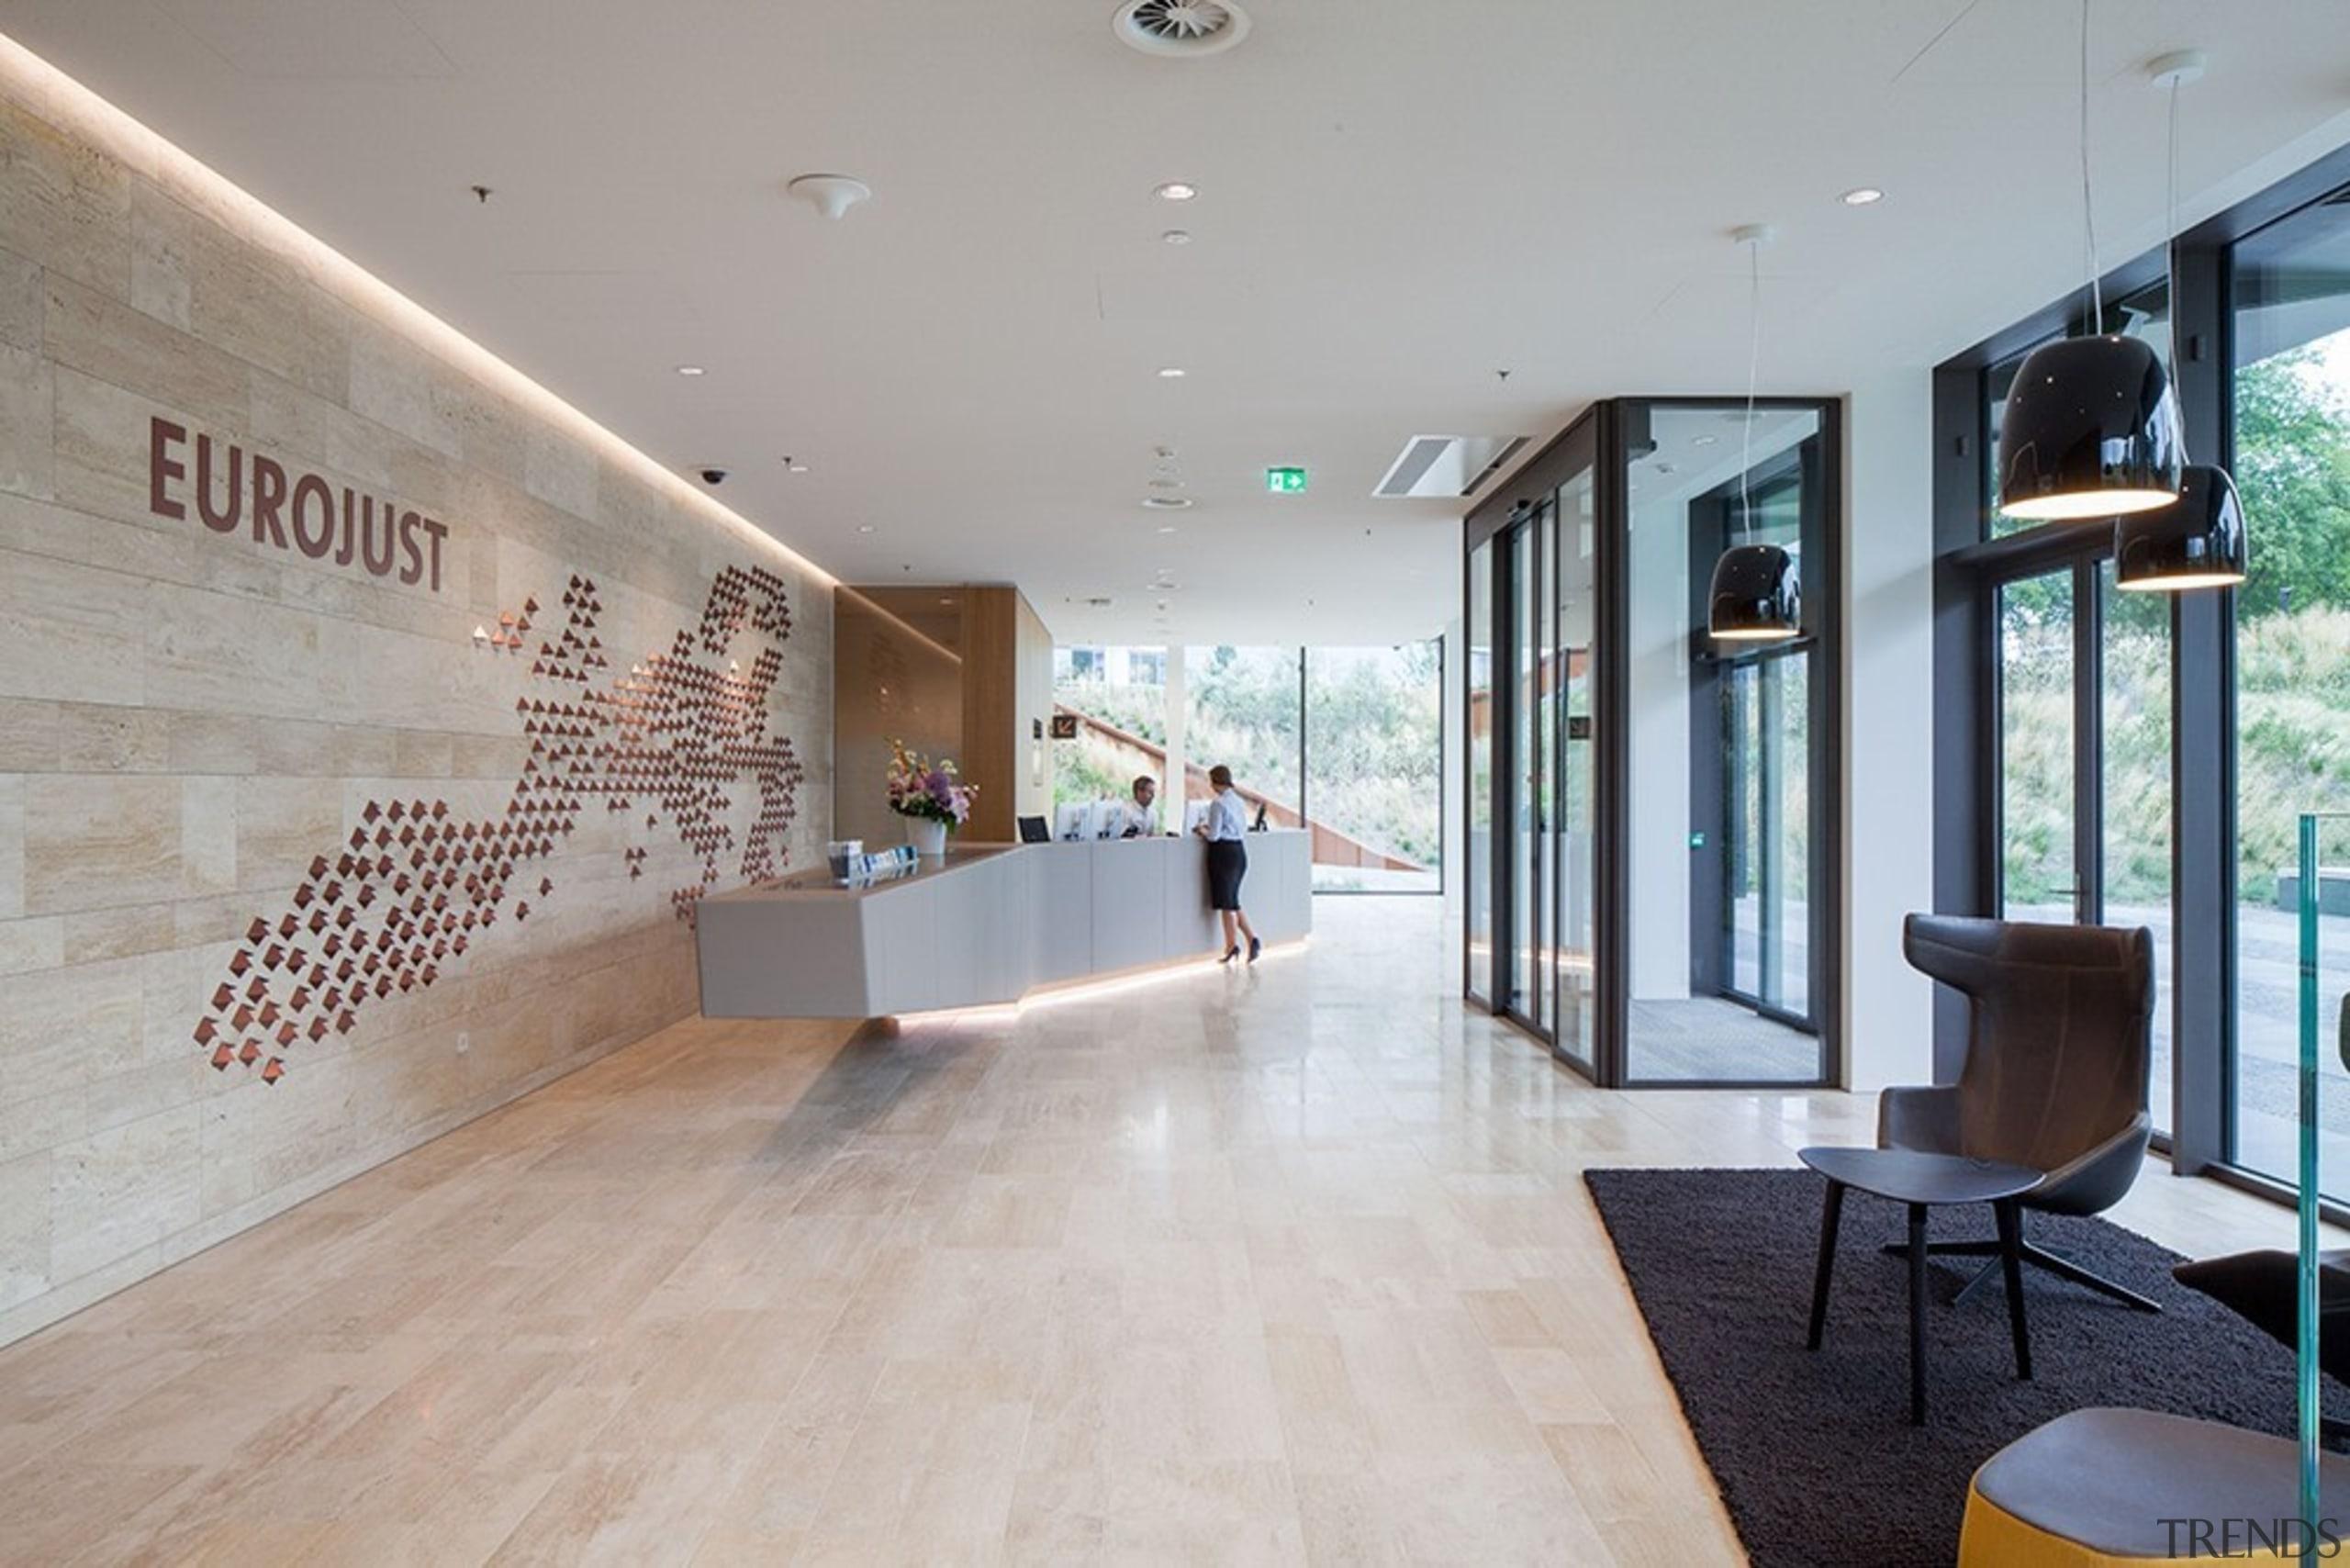 Eurojust - ceiling | floor | flooring | ceiling, floor, flooring, interior design, lobby, real estate, gray